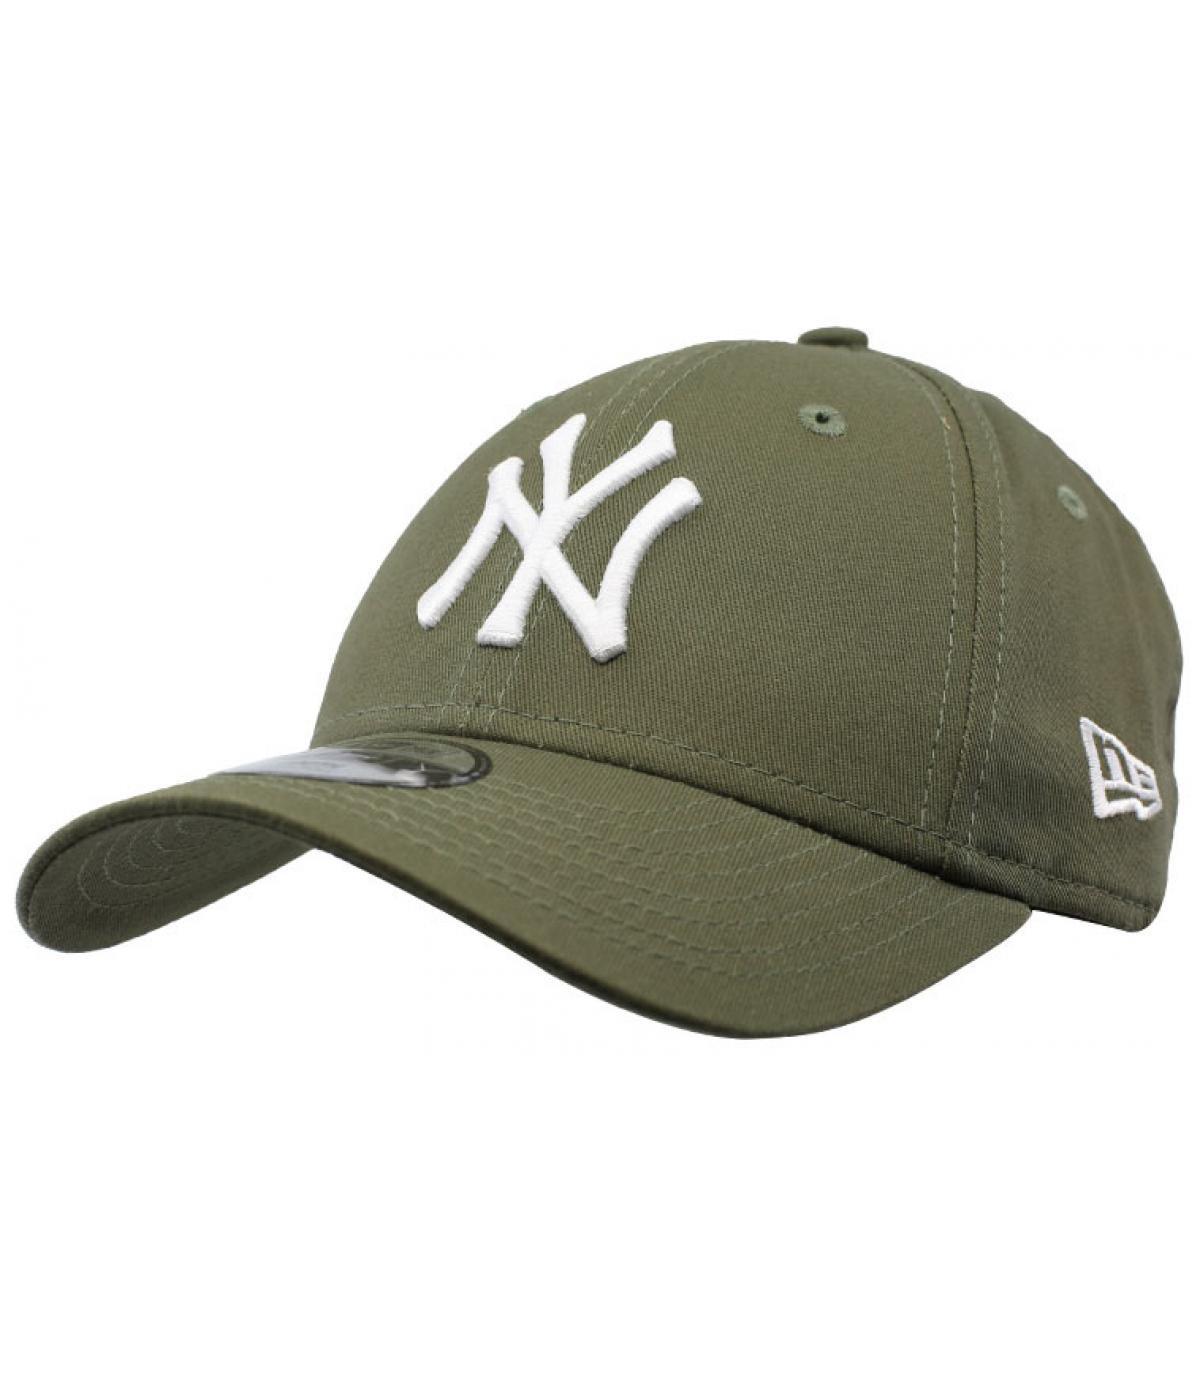 New Era. NY berretto bambino verde. Dettagli Kids League Ess NY 9Forty olive  - image 2 ... 203310954011